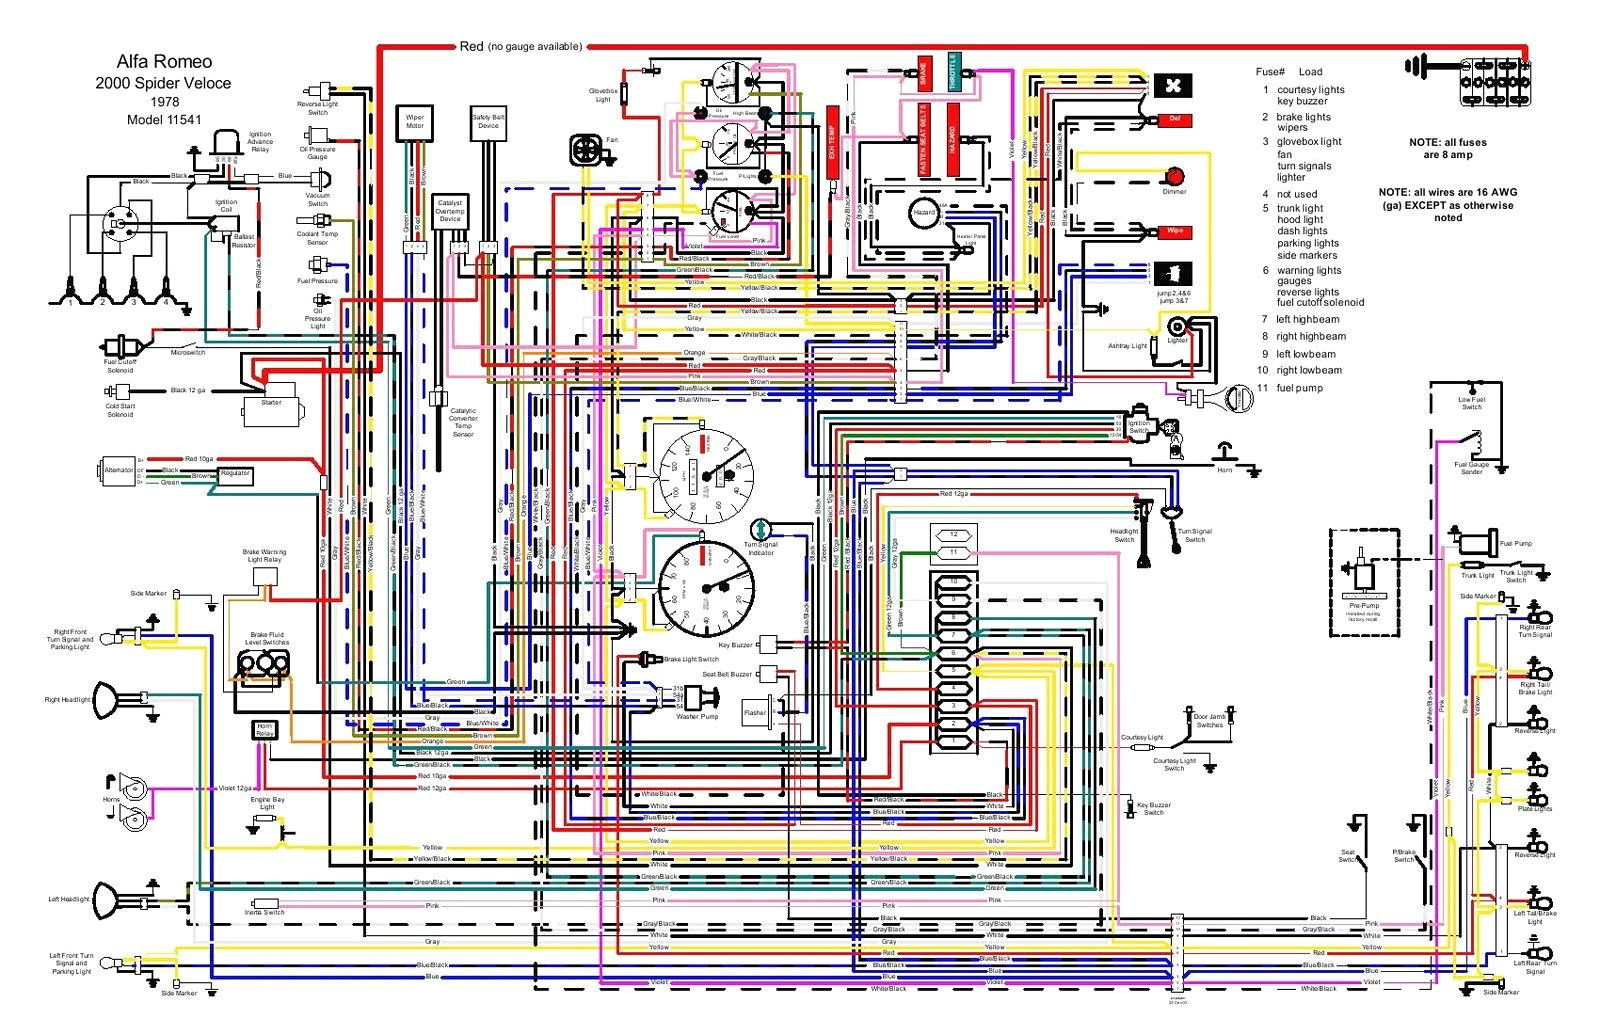 hight resolution of alfa romeo accessories alfa circuit diagrams new wiring diagram alfa romeo 147 stereo wiring diagram